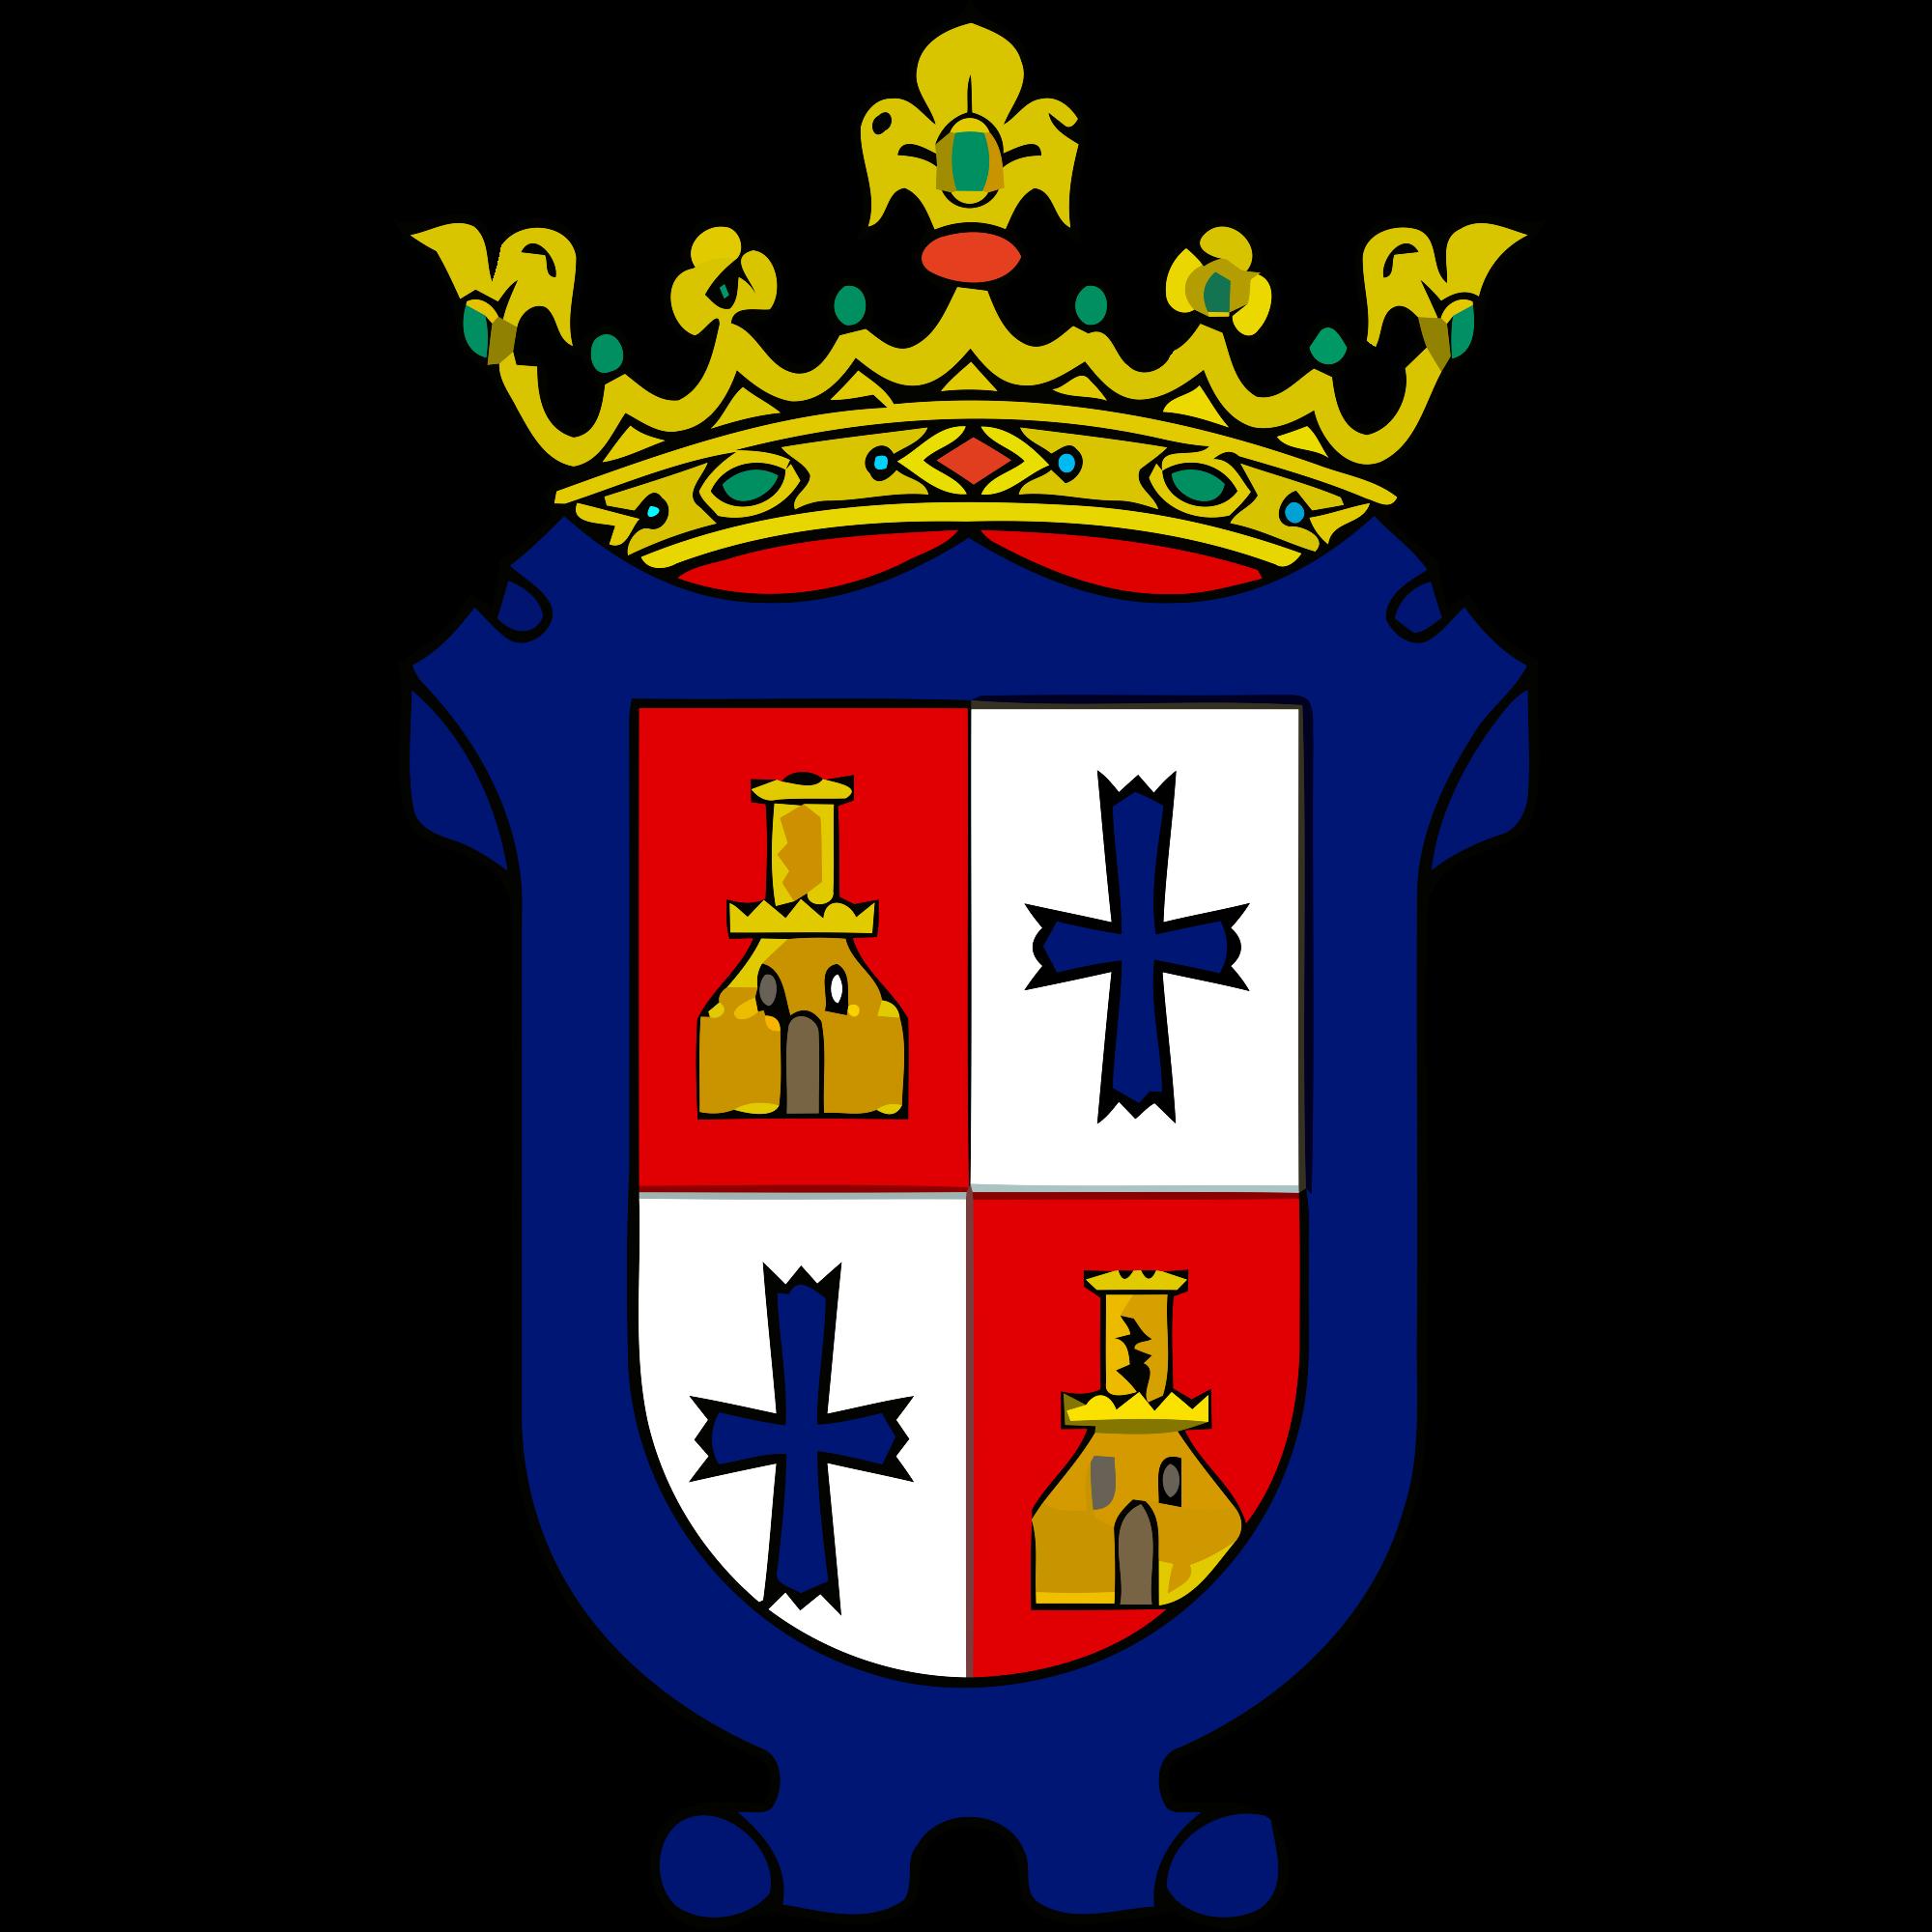 JORGE DE PRADA RUIZ DE LEÓN